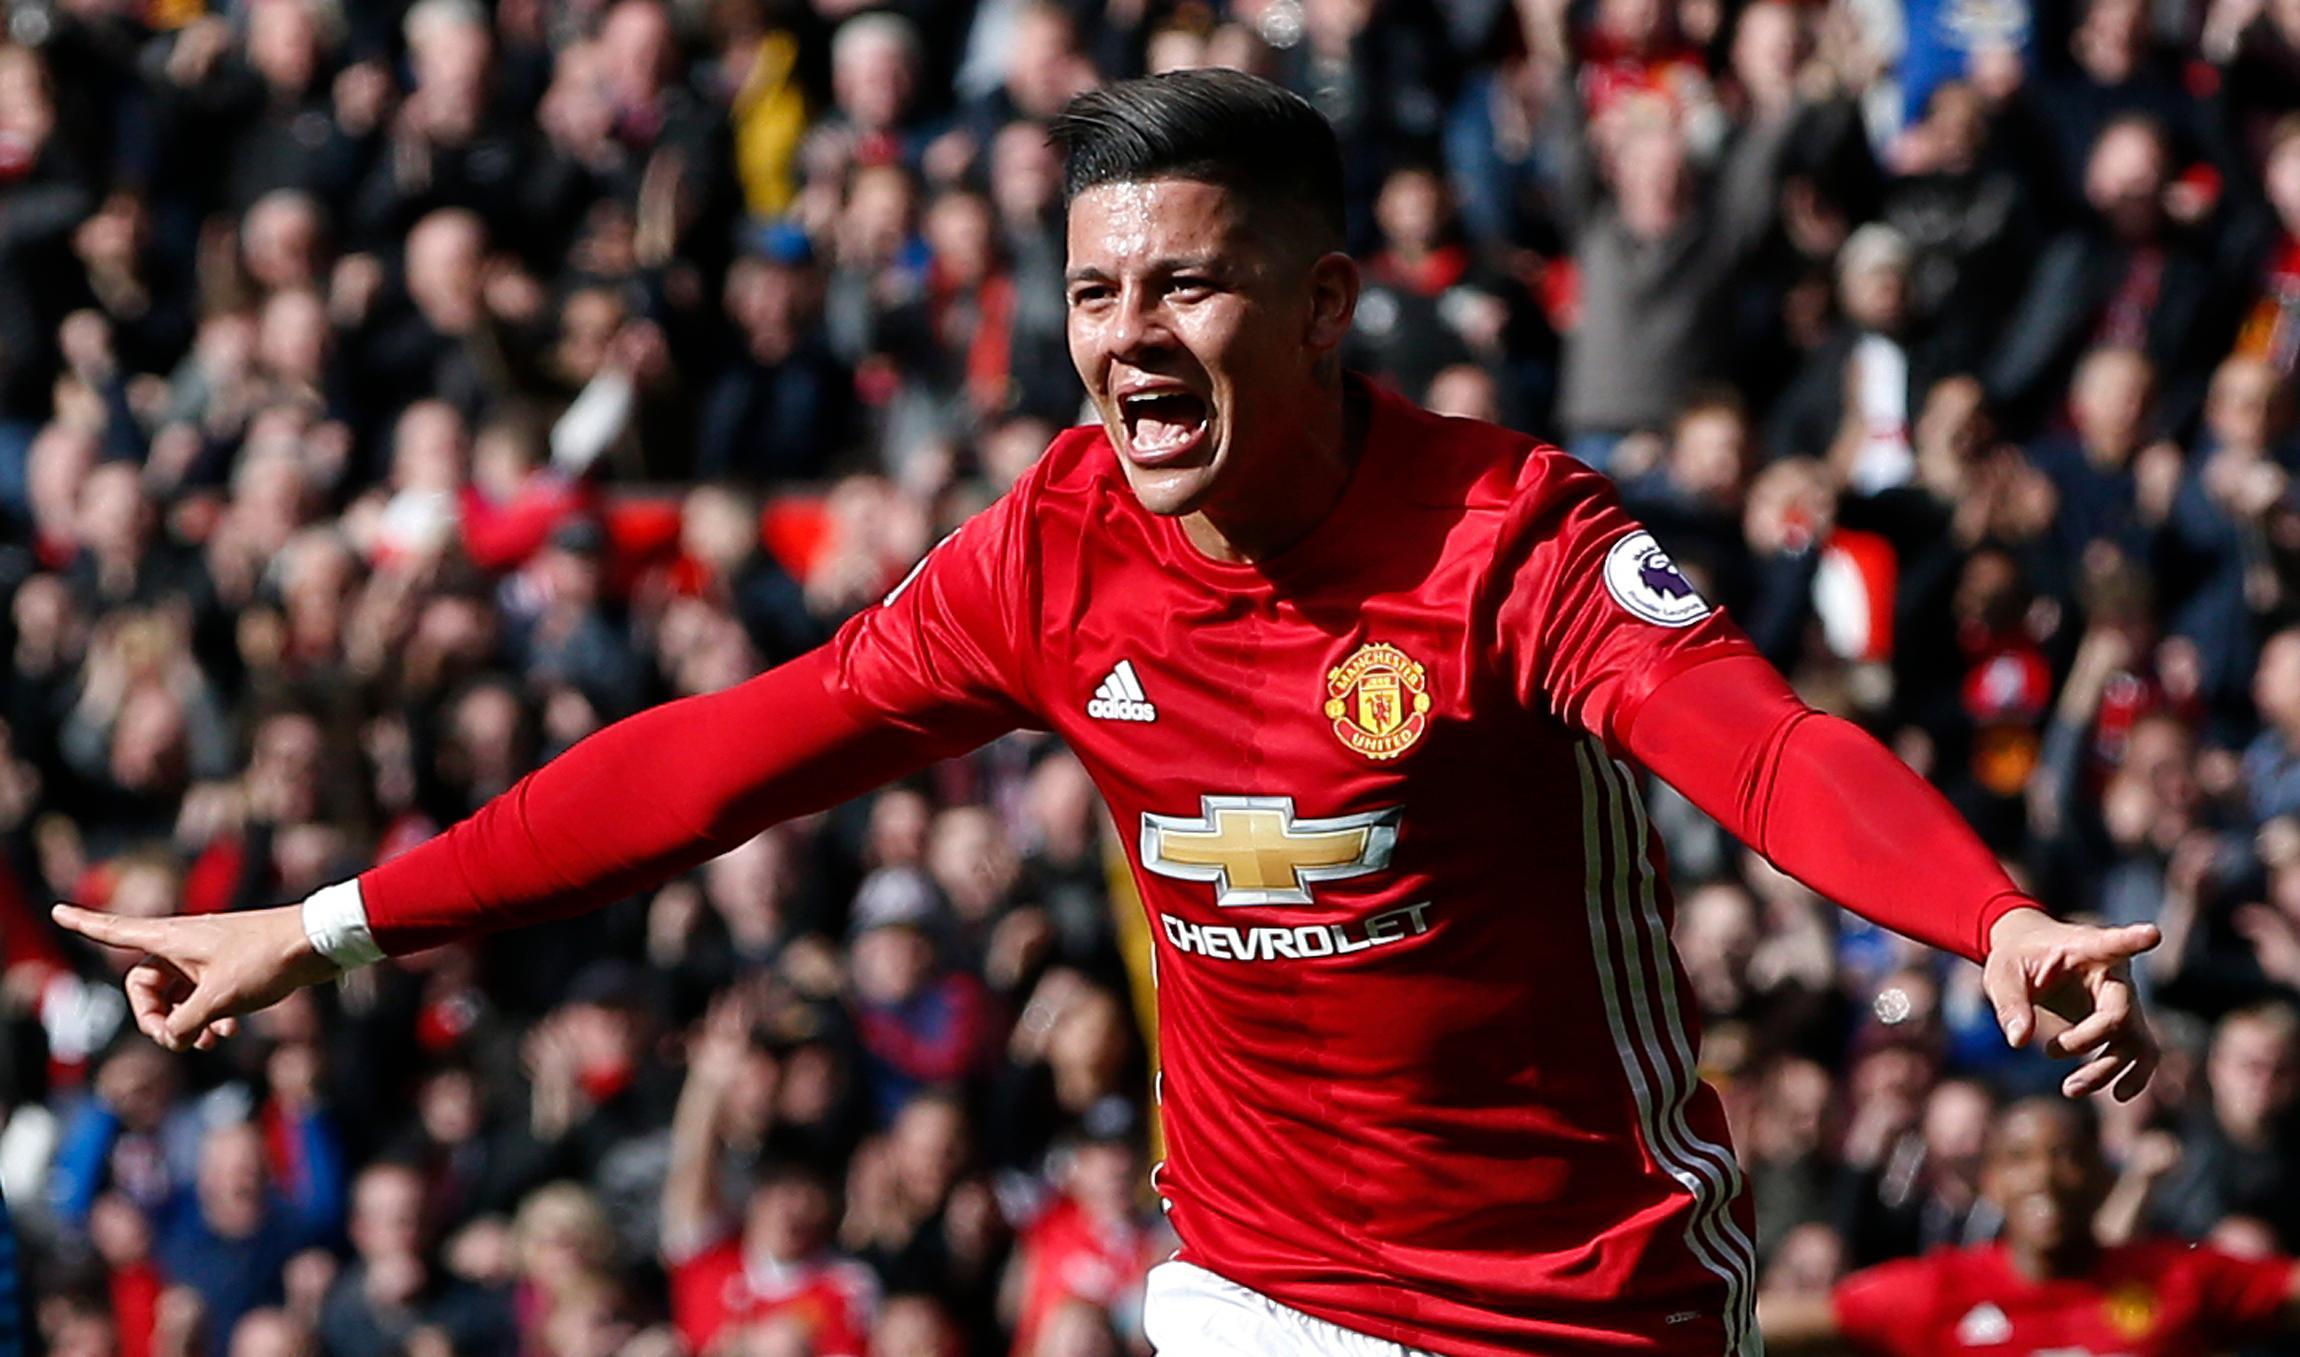 Rojo Offered Fresh Start On Merseyside